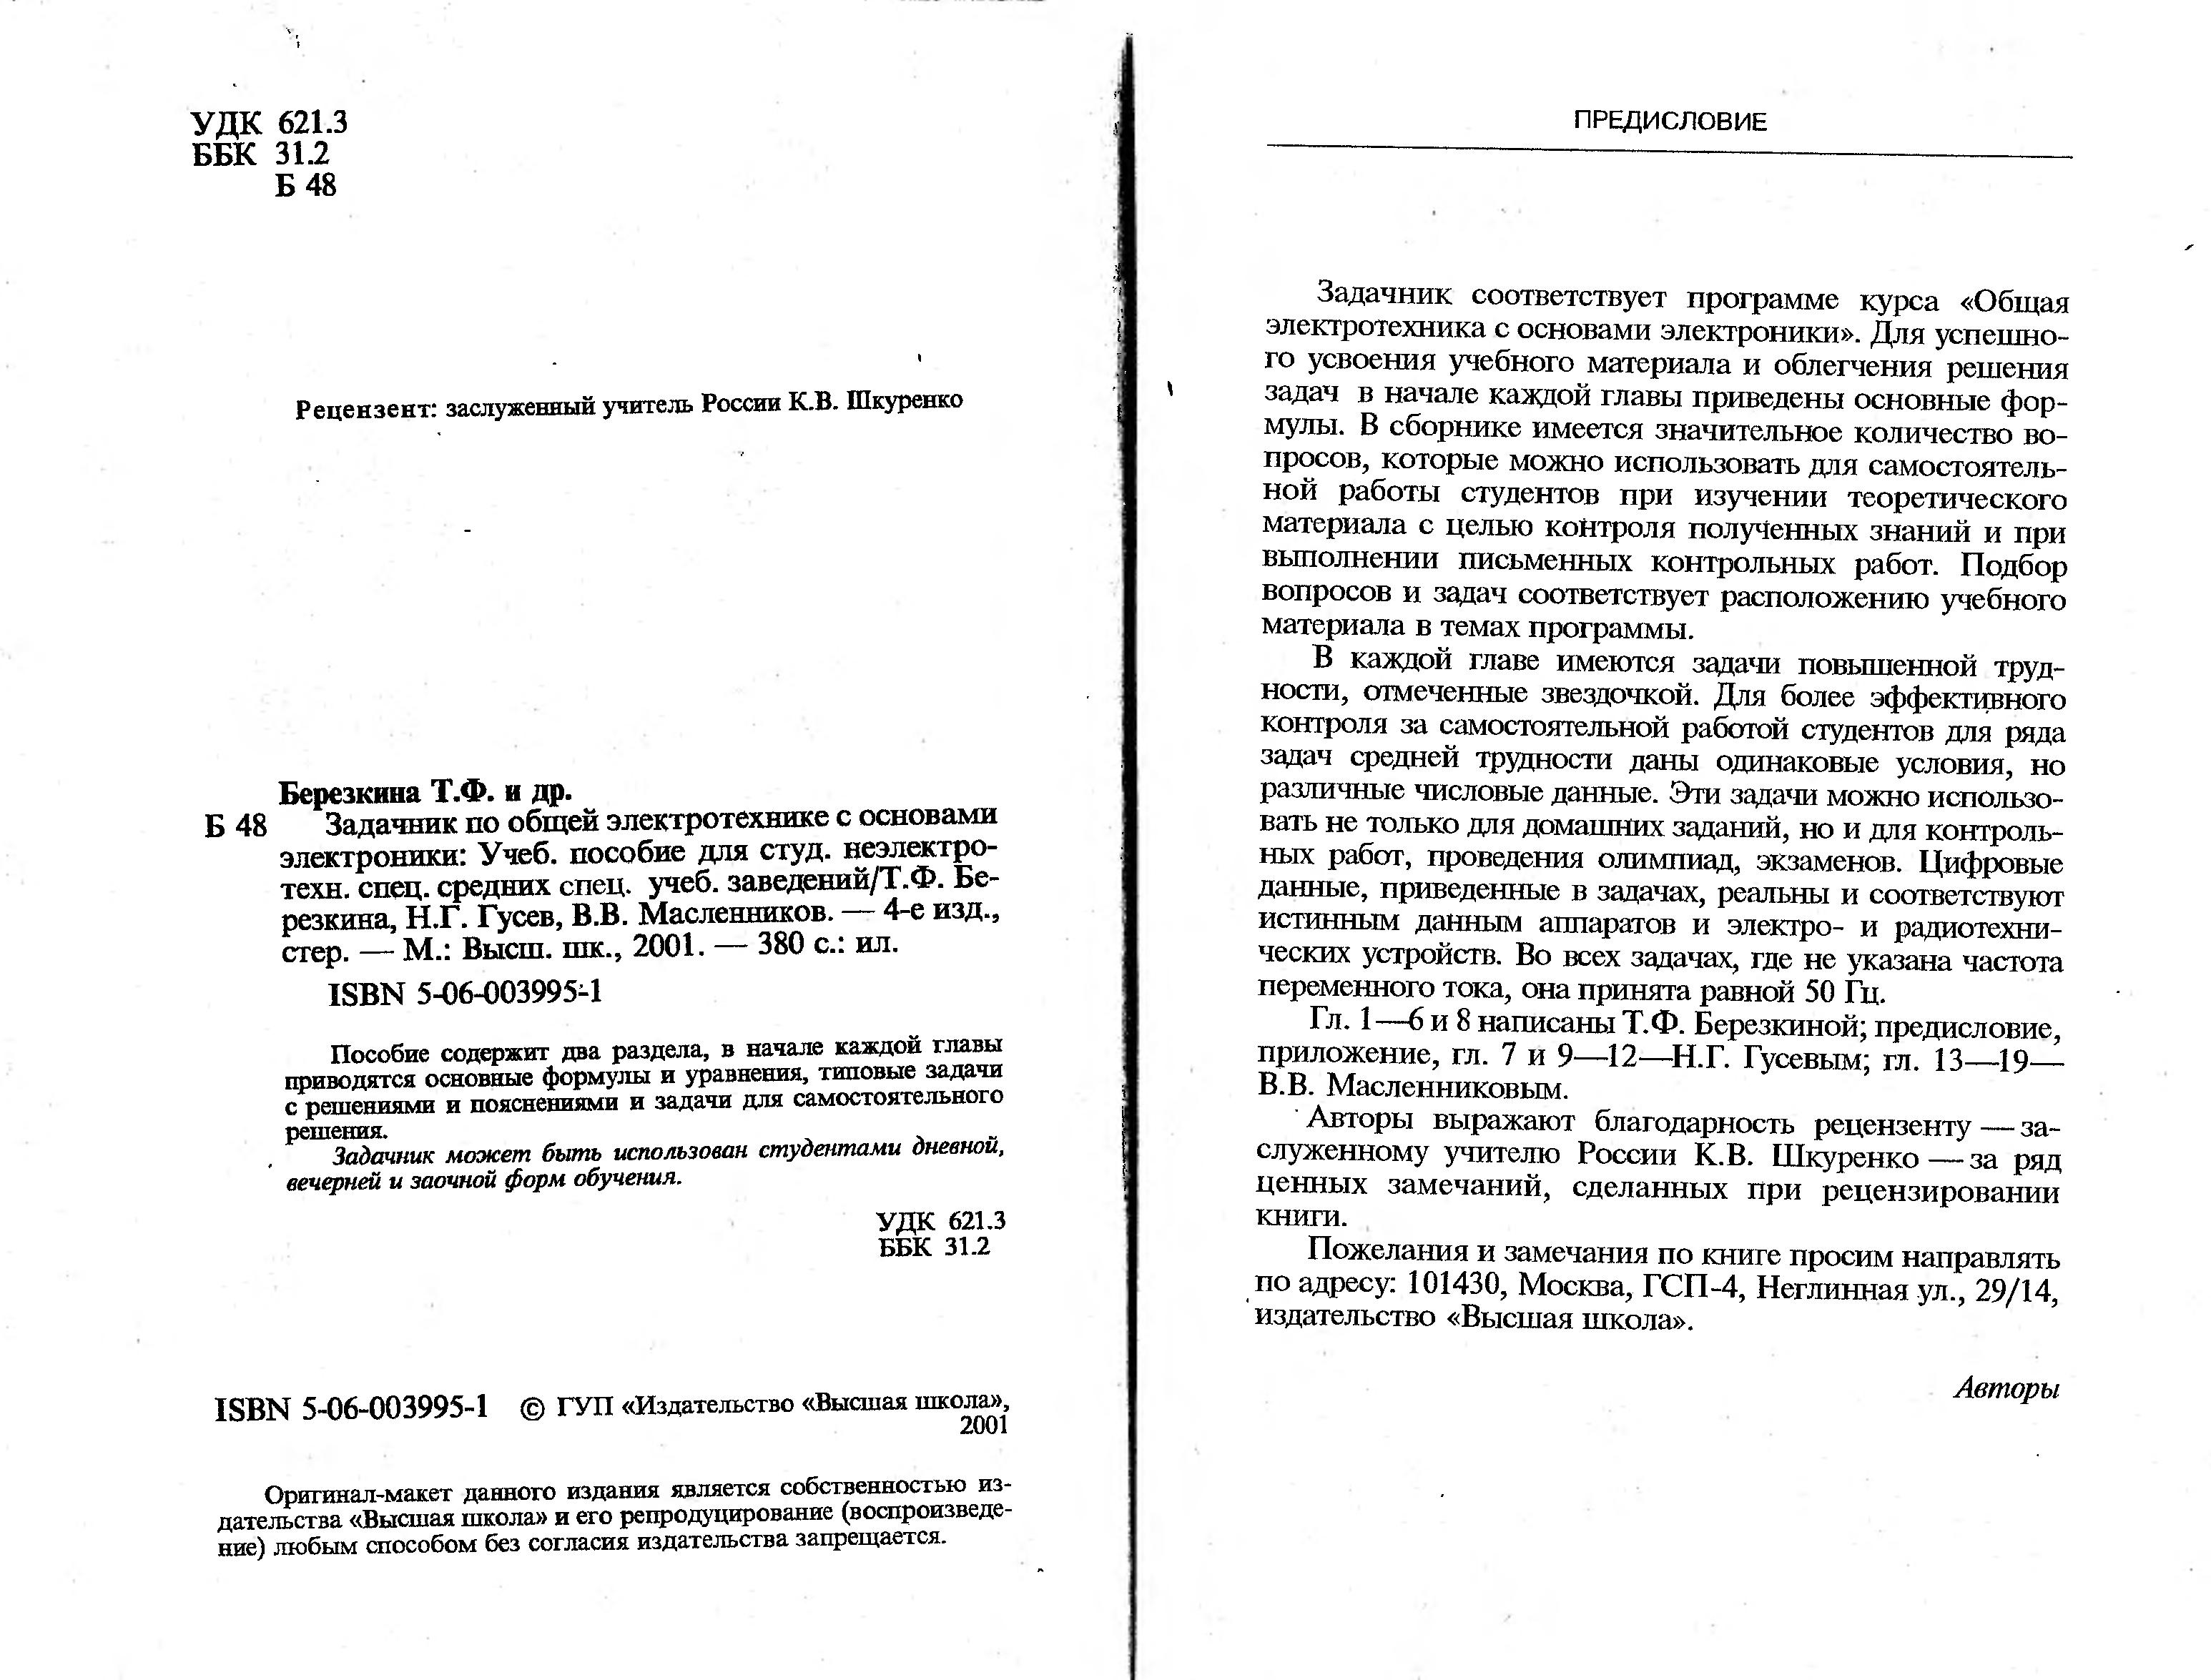 т.ф березкина н.г гусев решебник